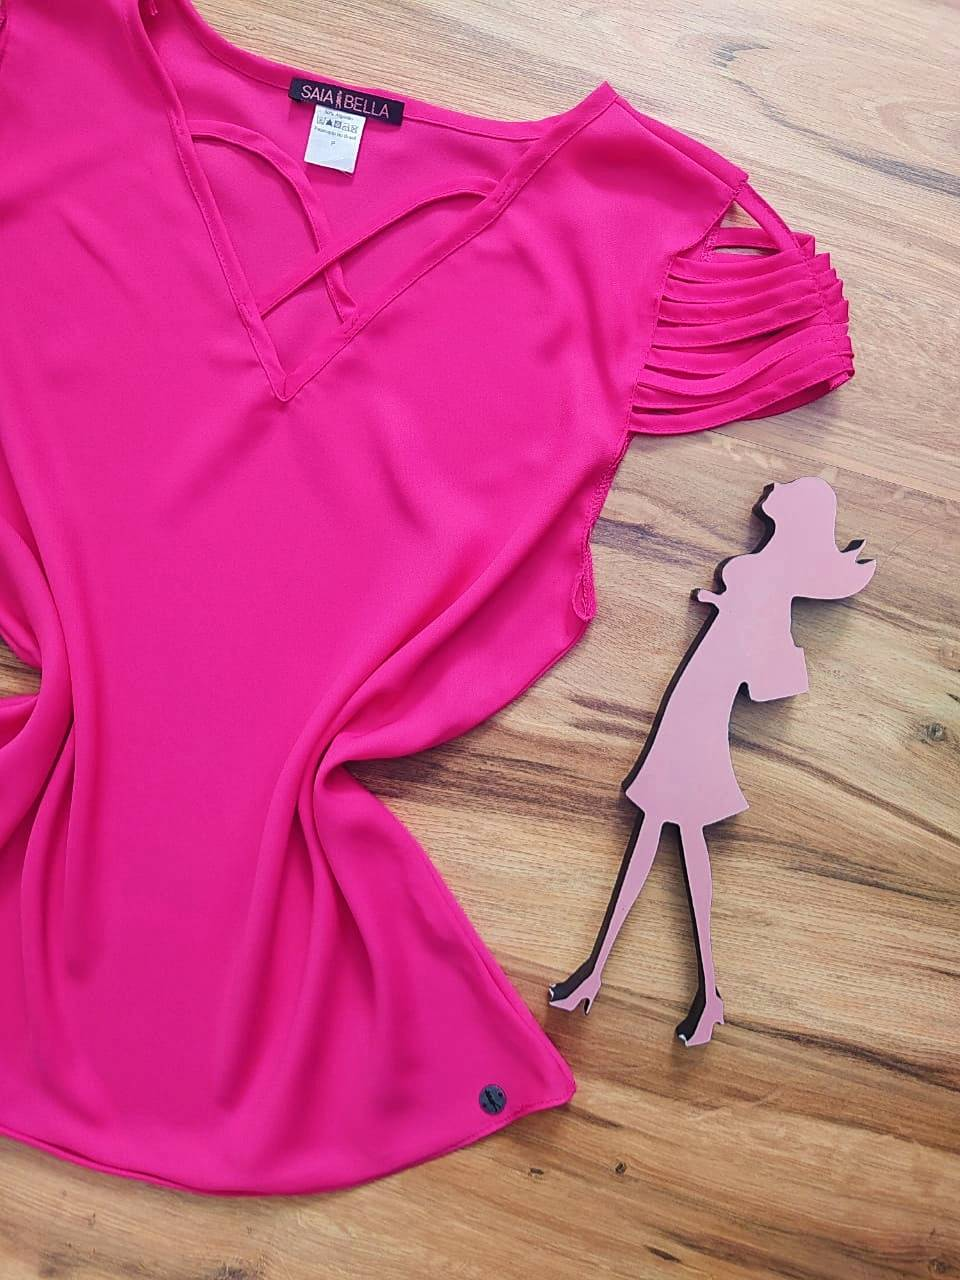 Blusa Sheila Saia Bella - SB8018804. pink